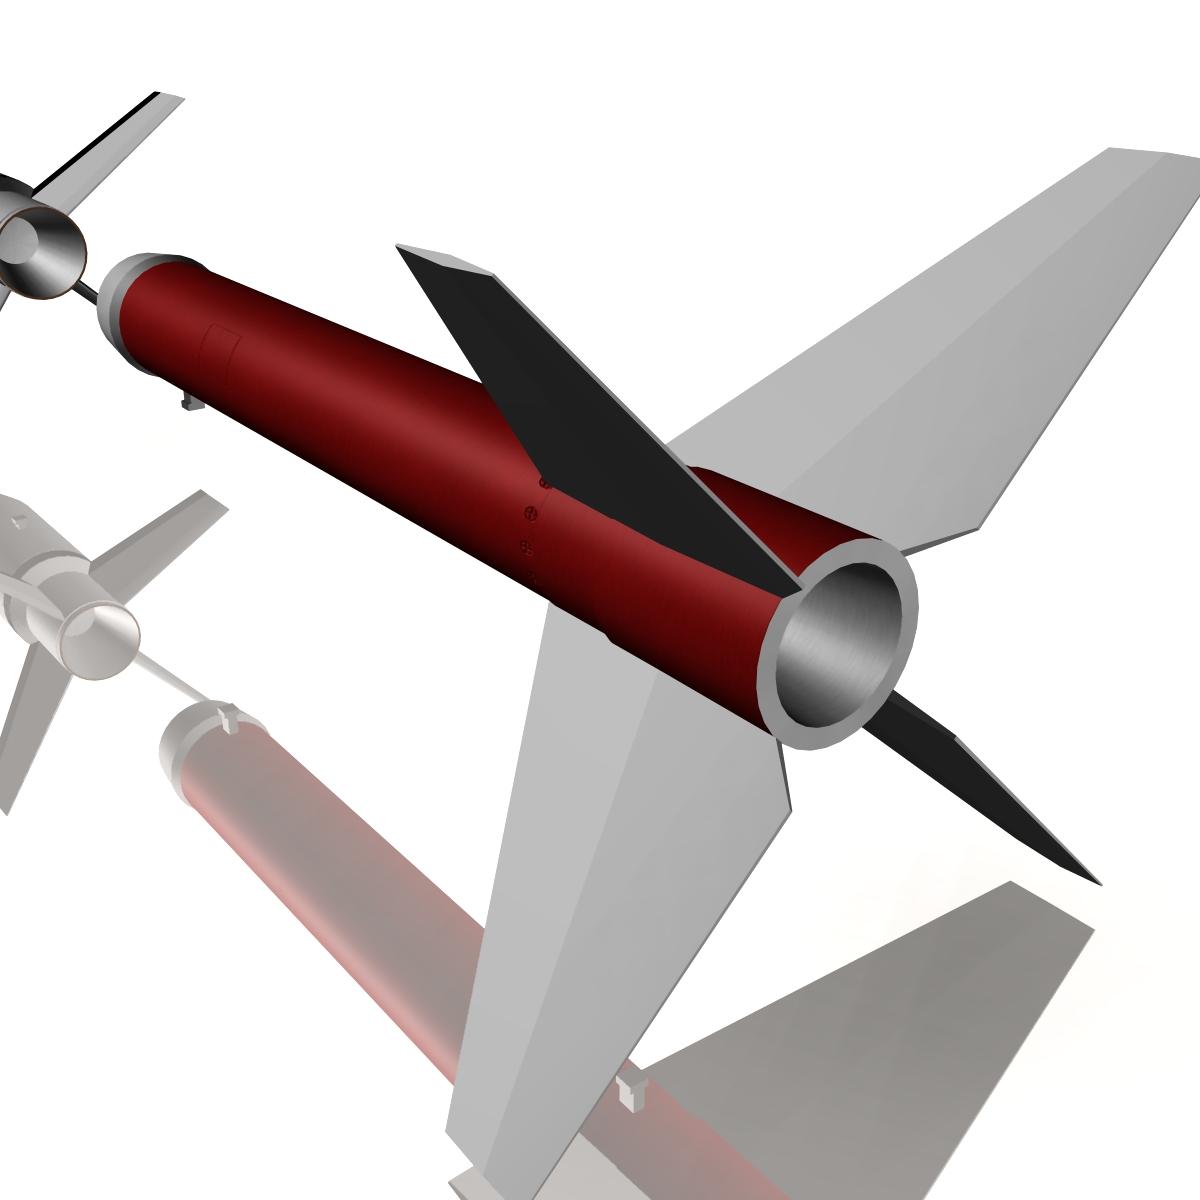 Astrobee 200 Rocket 3d model 3ds dxf fbx blend cob dae X   obj 165948